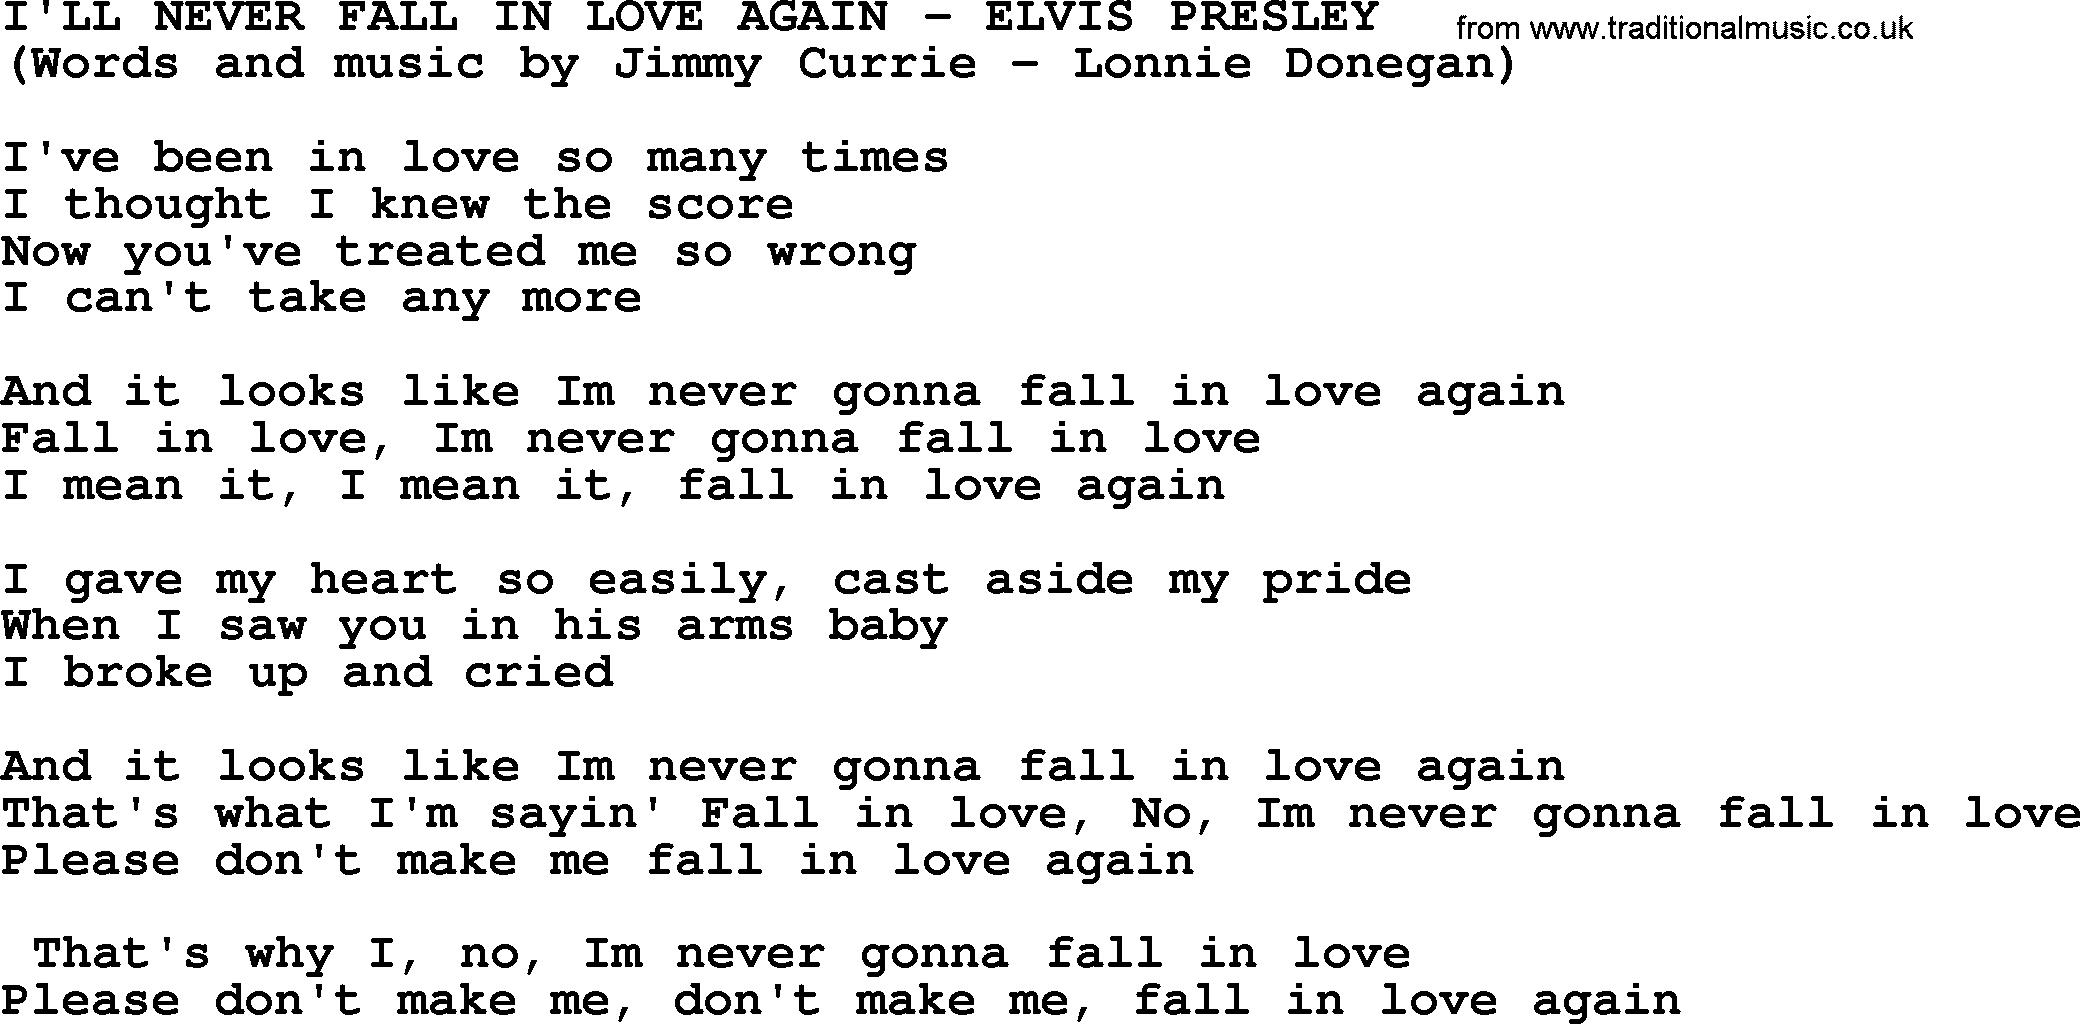 Ill Never Fall In Love Again By Elvis Presley Lyrics